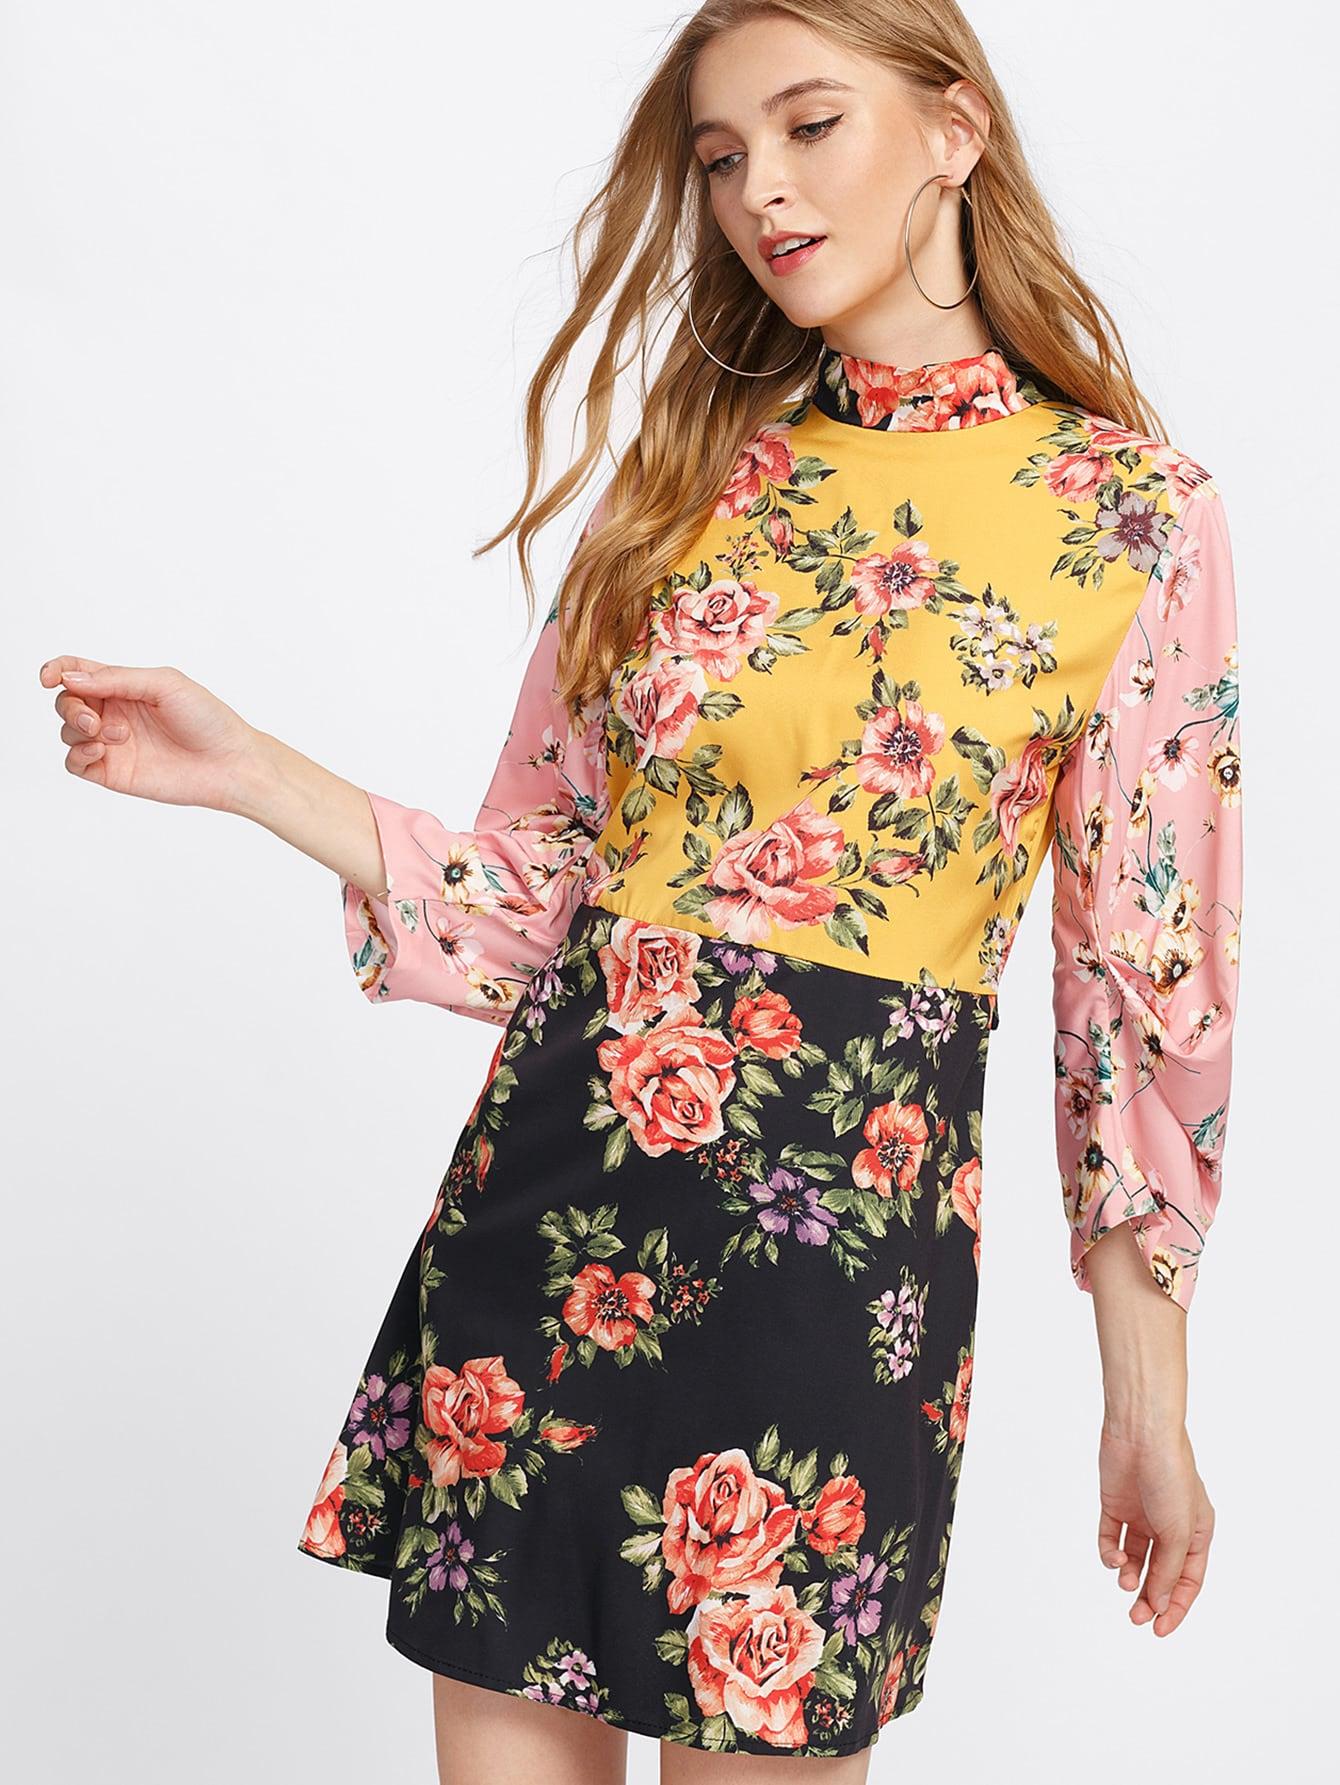 Tie Back Floral Dress tie back floral dress